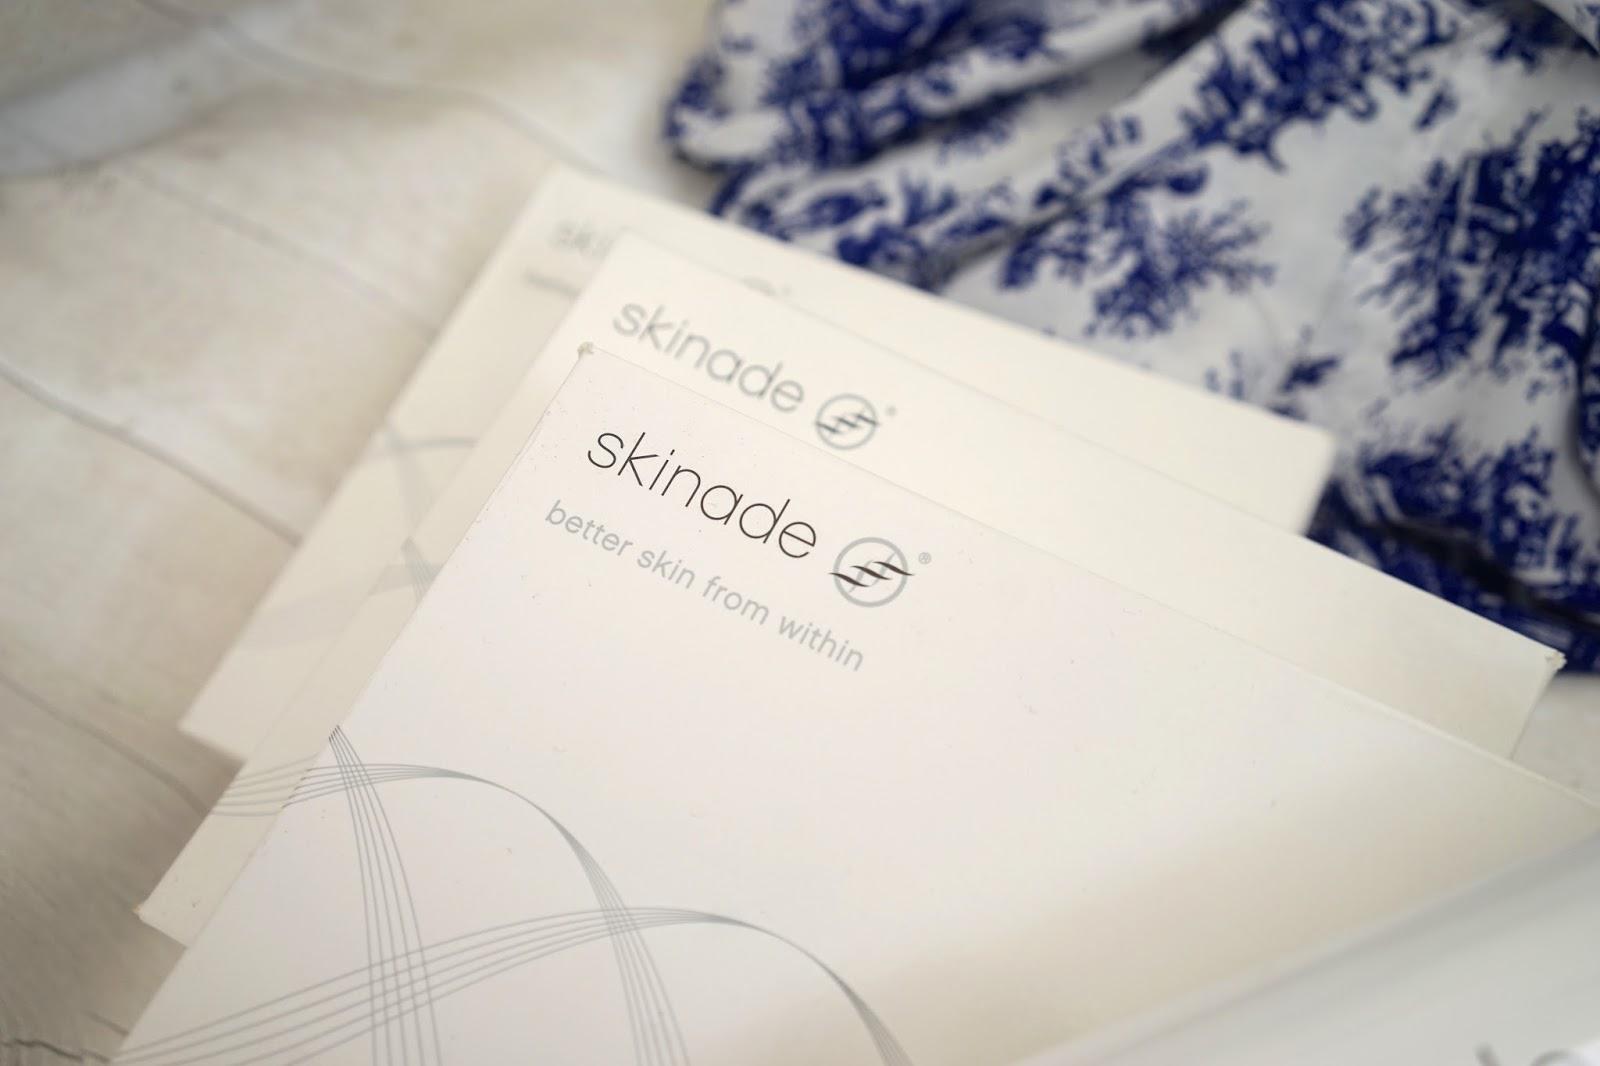 skinade review